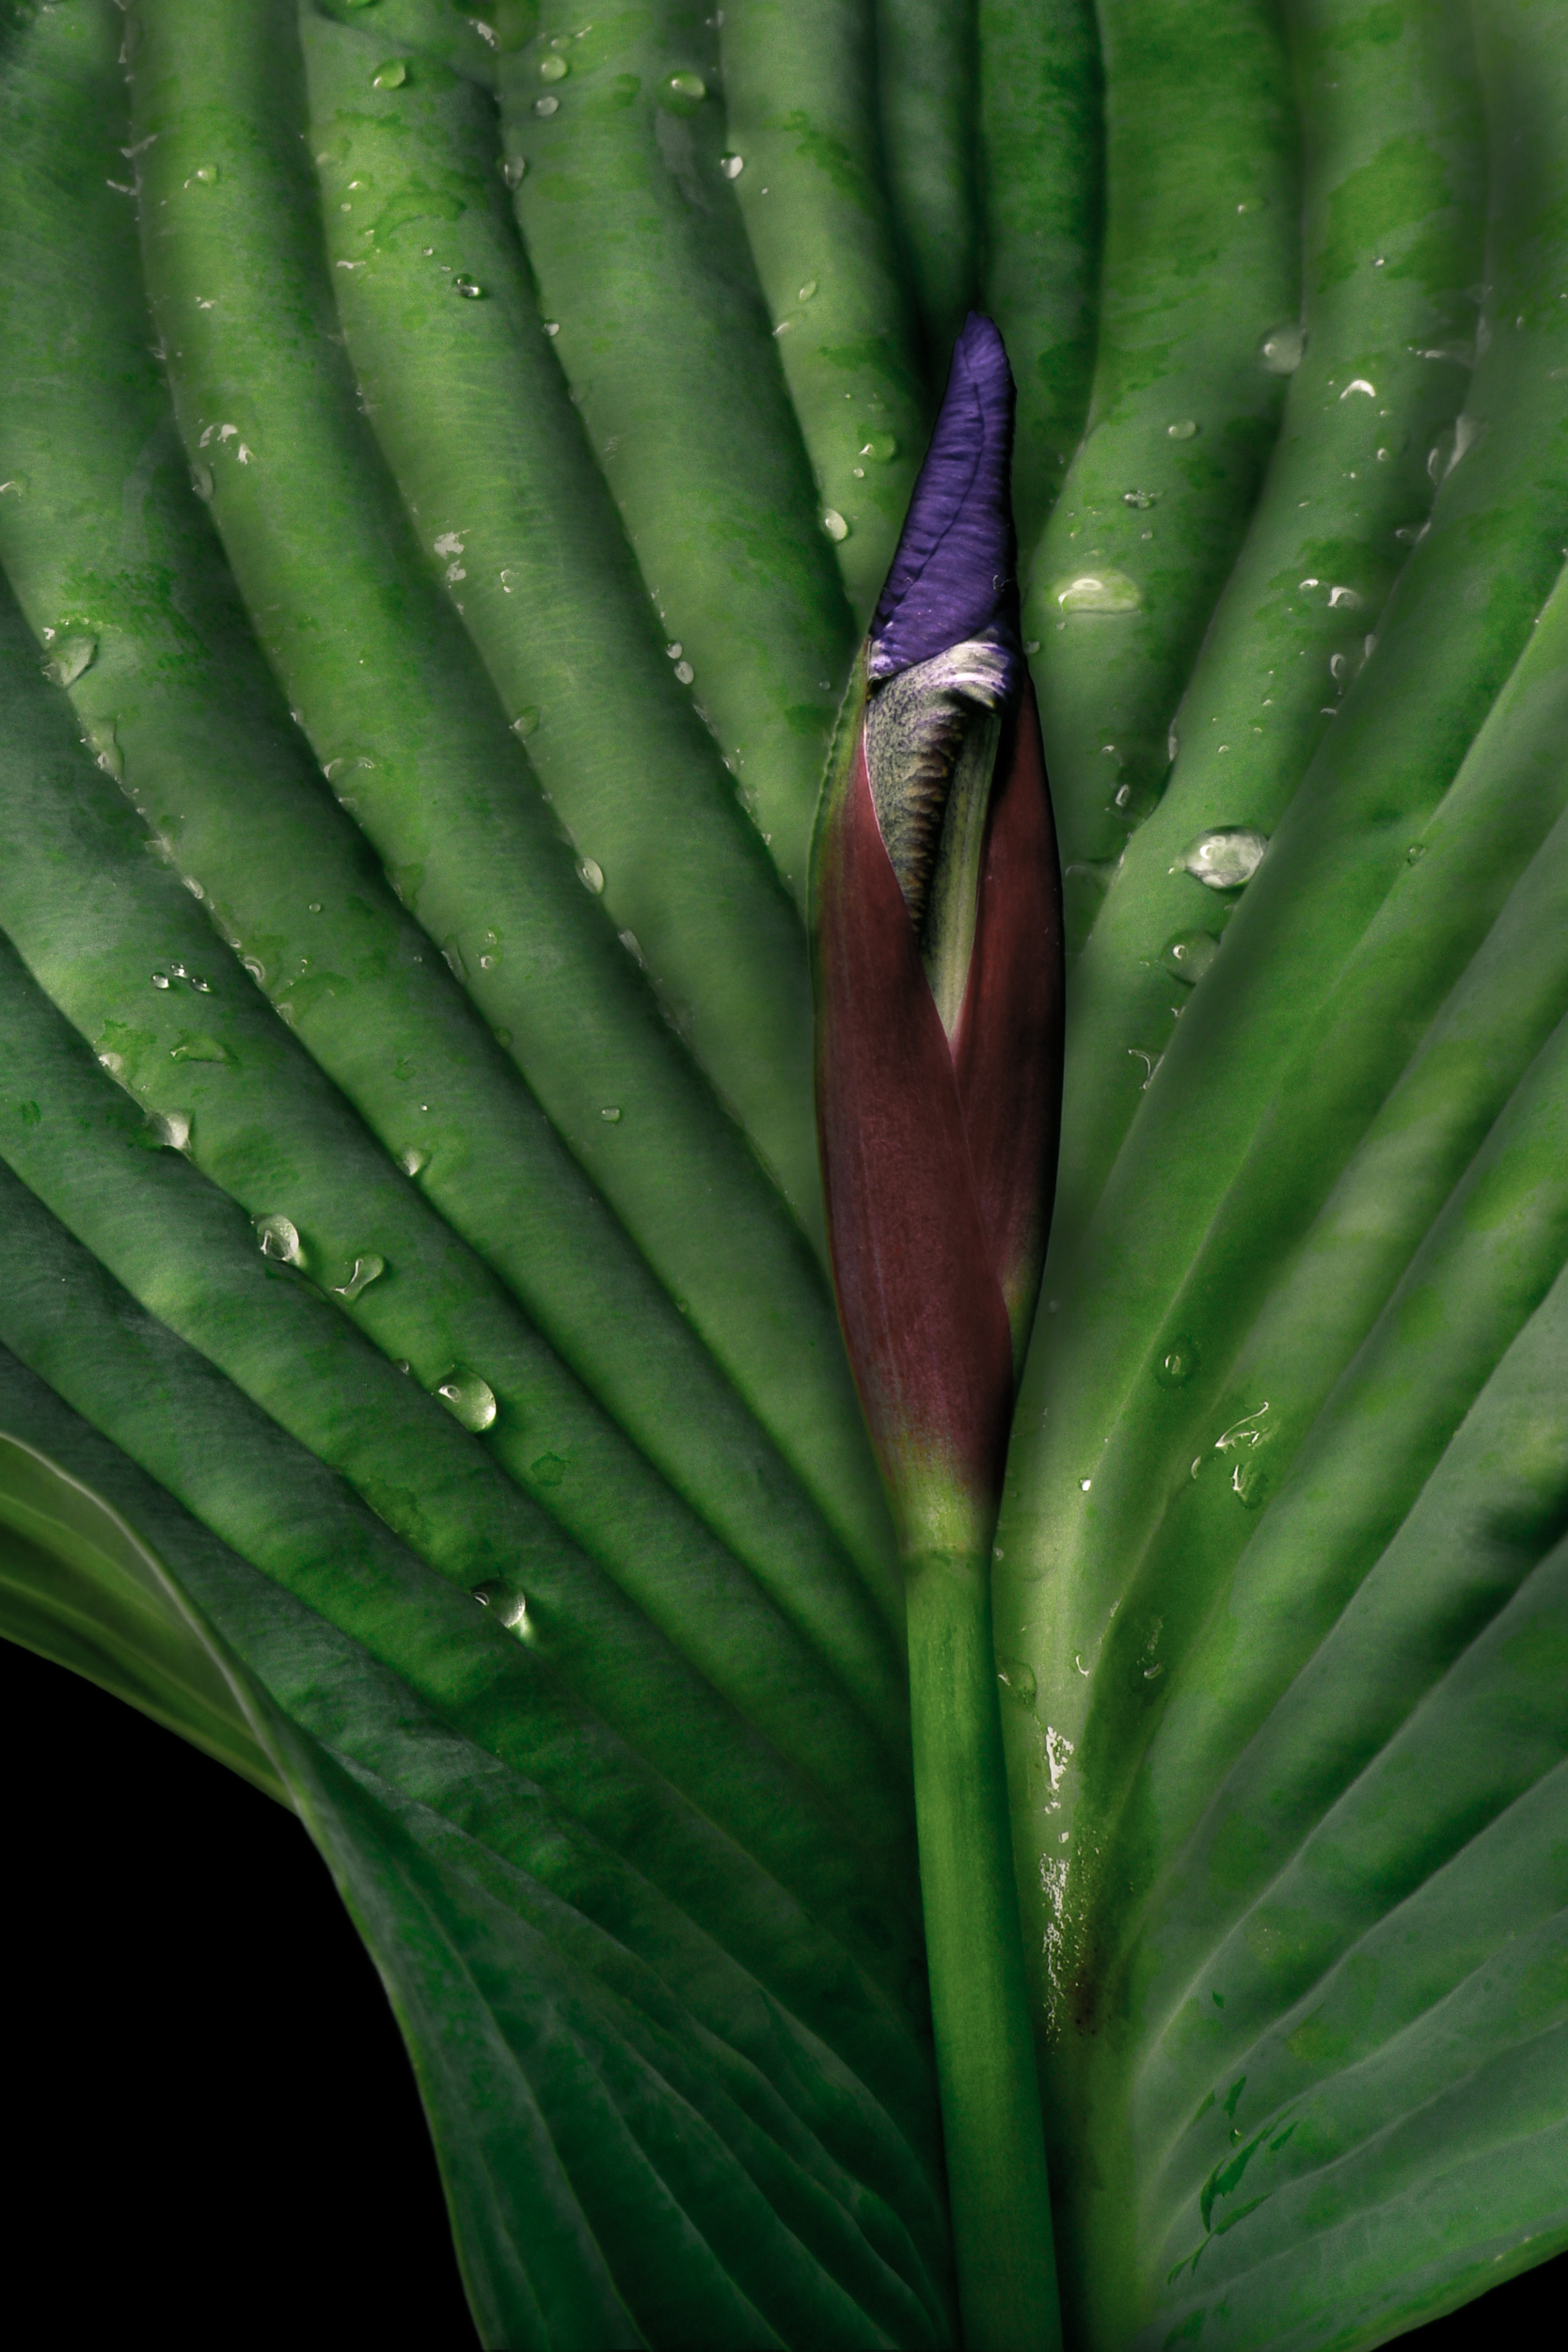 Iris in the Hosta